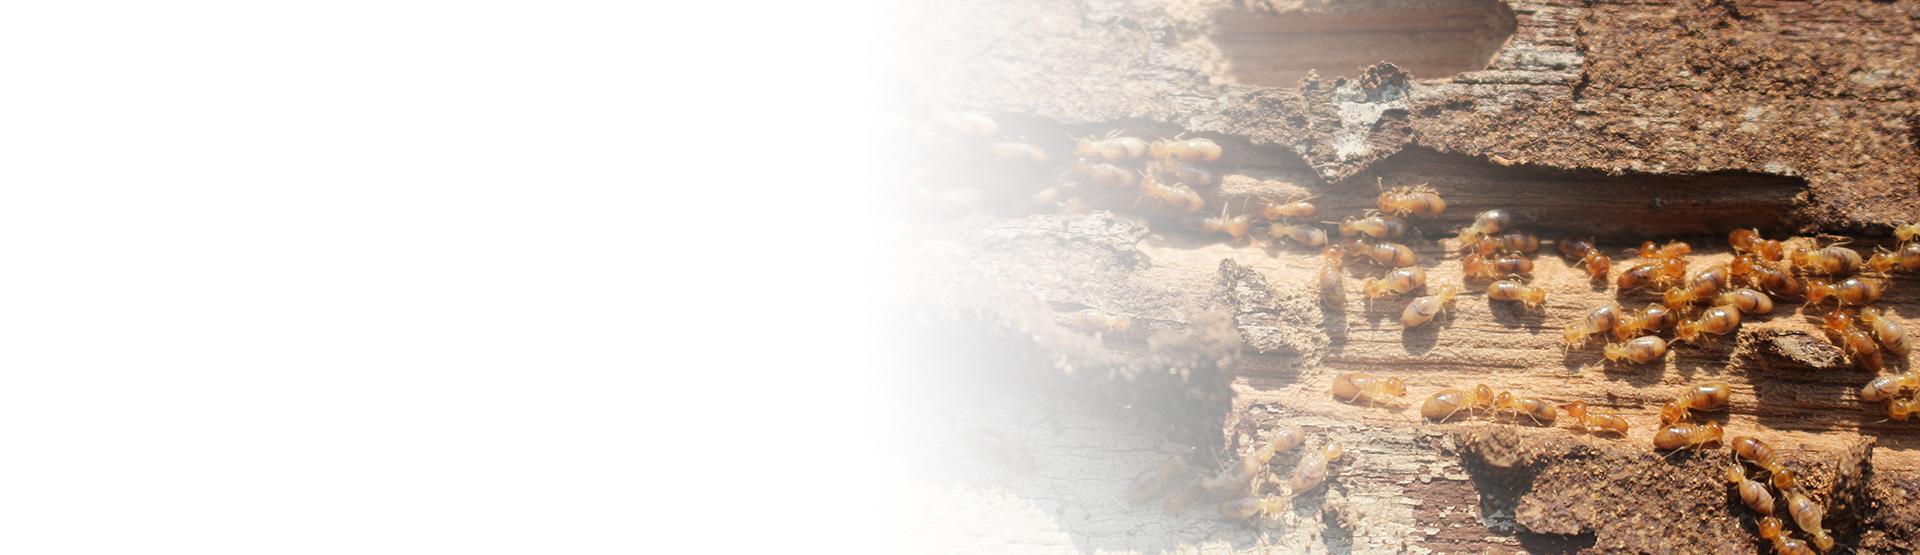 termite damage in kansas city